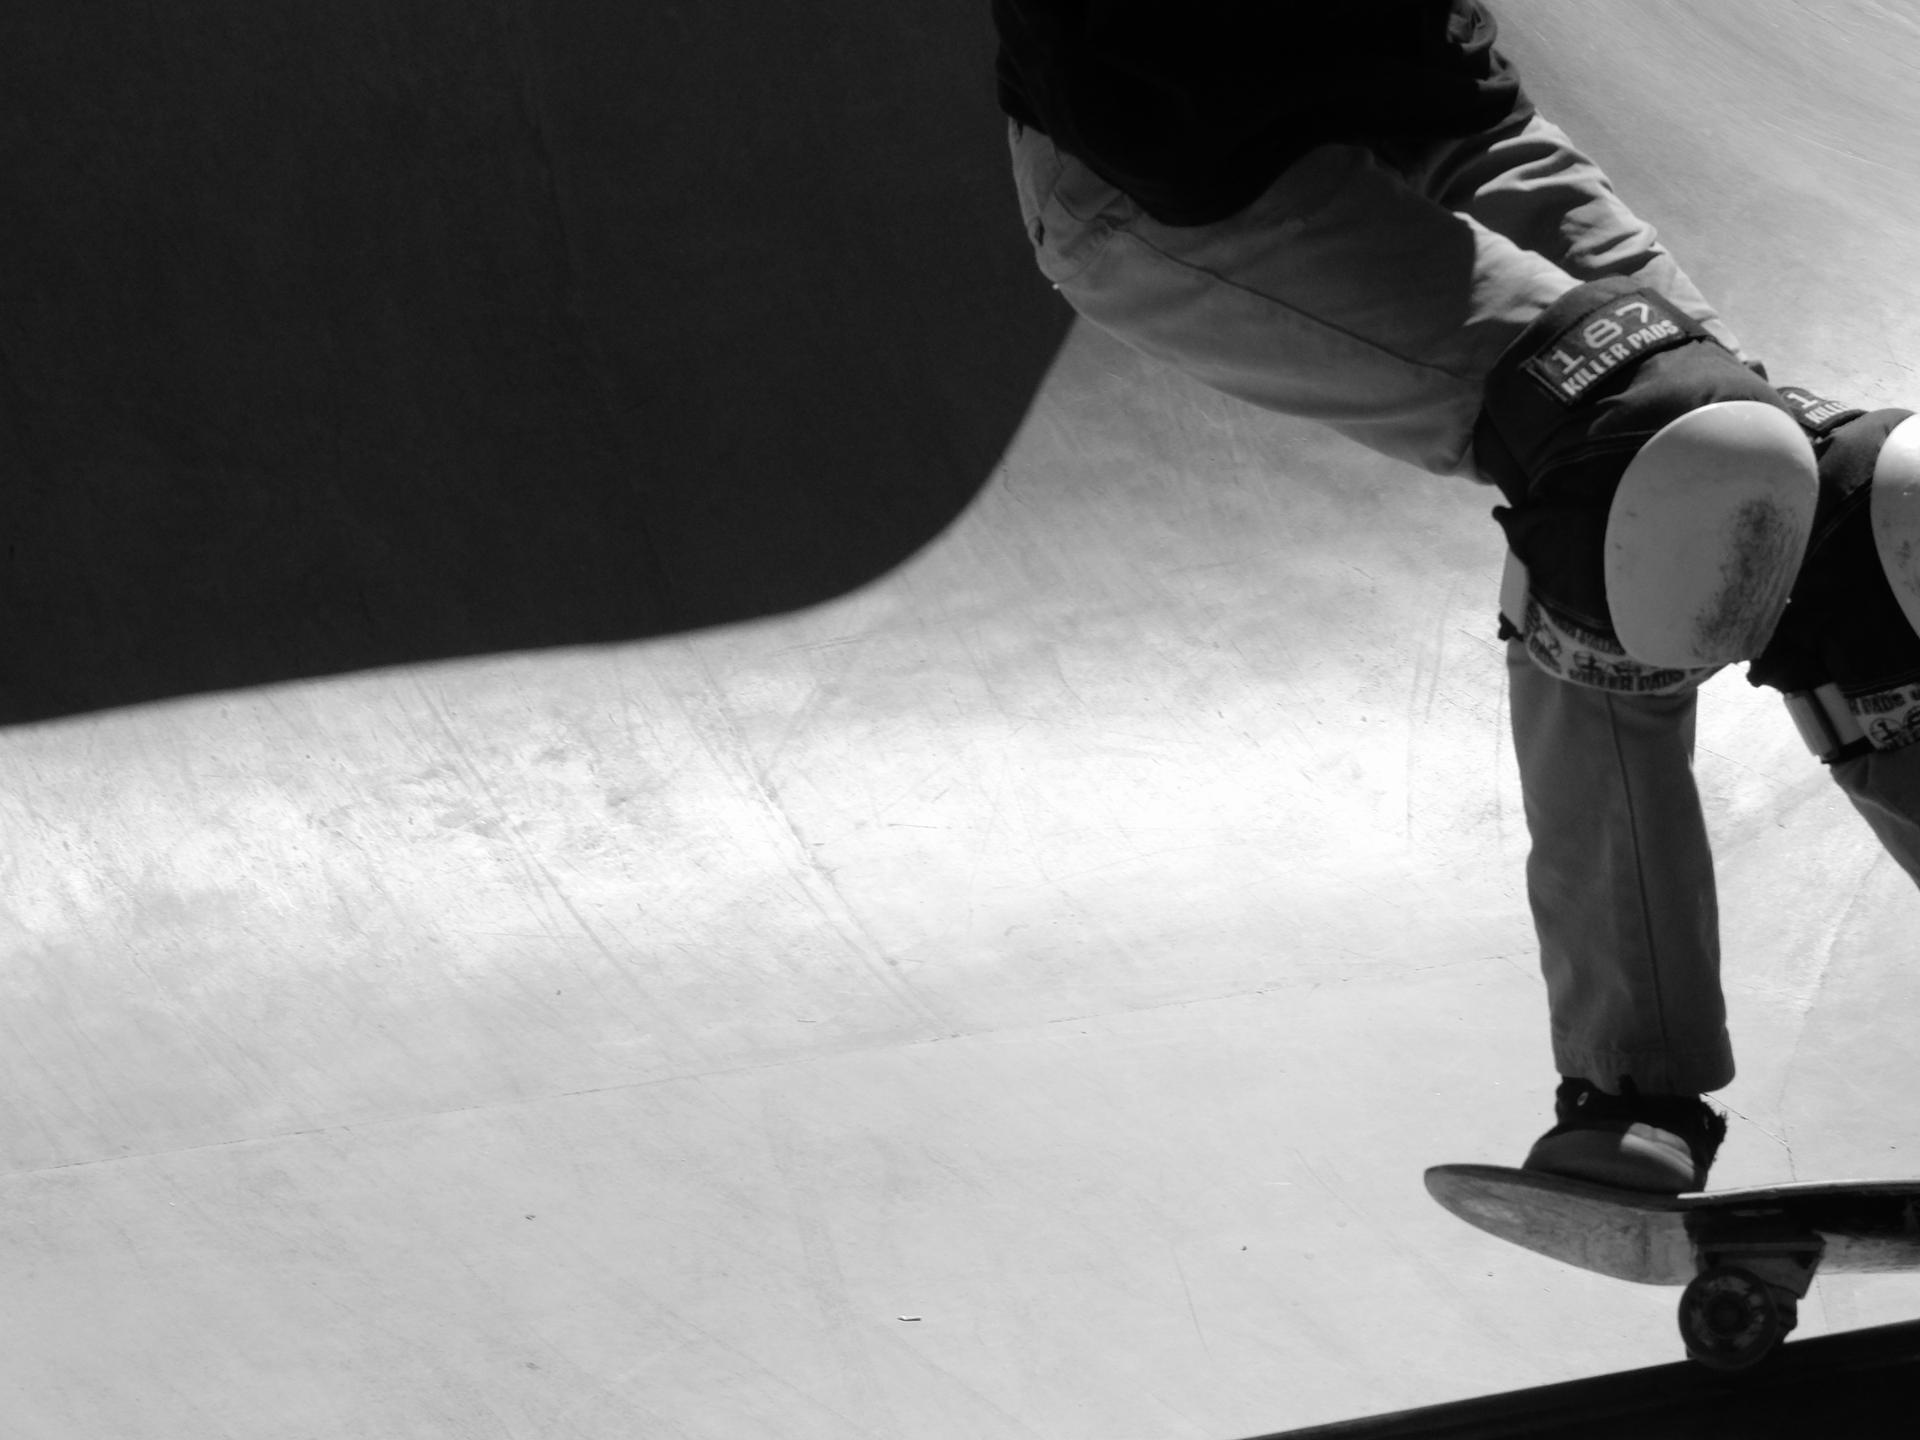 ombre et skate